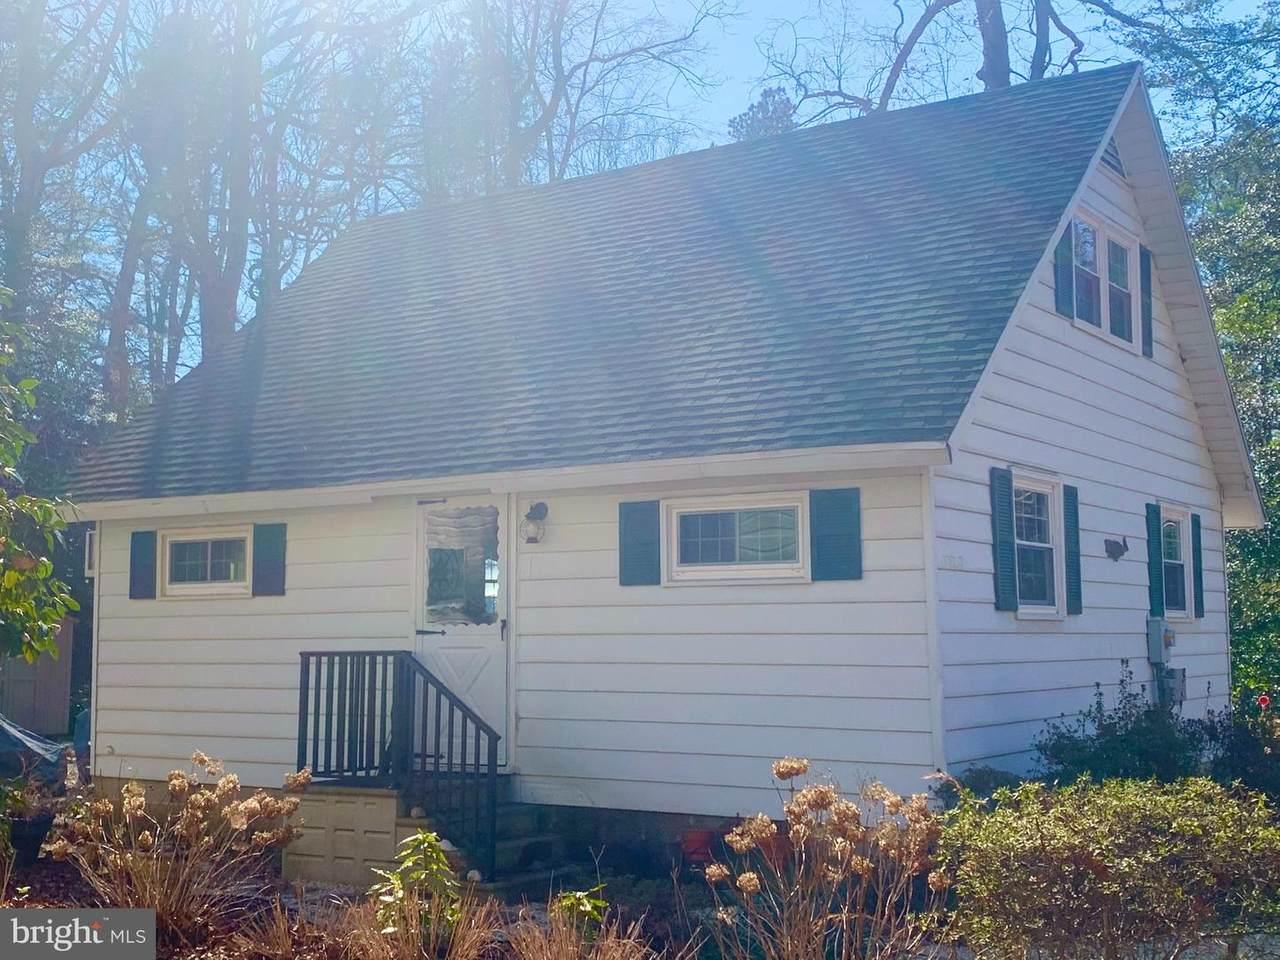 32860 Spruce Court - Photo 1